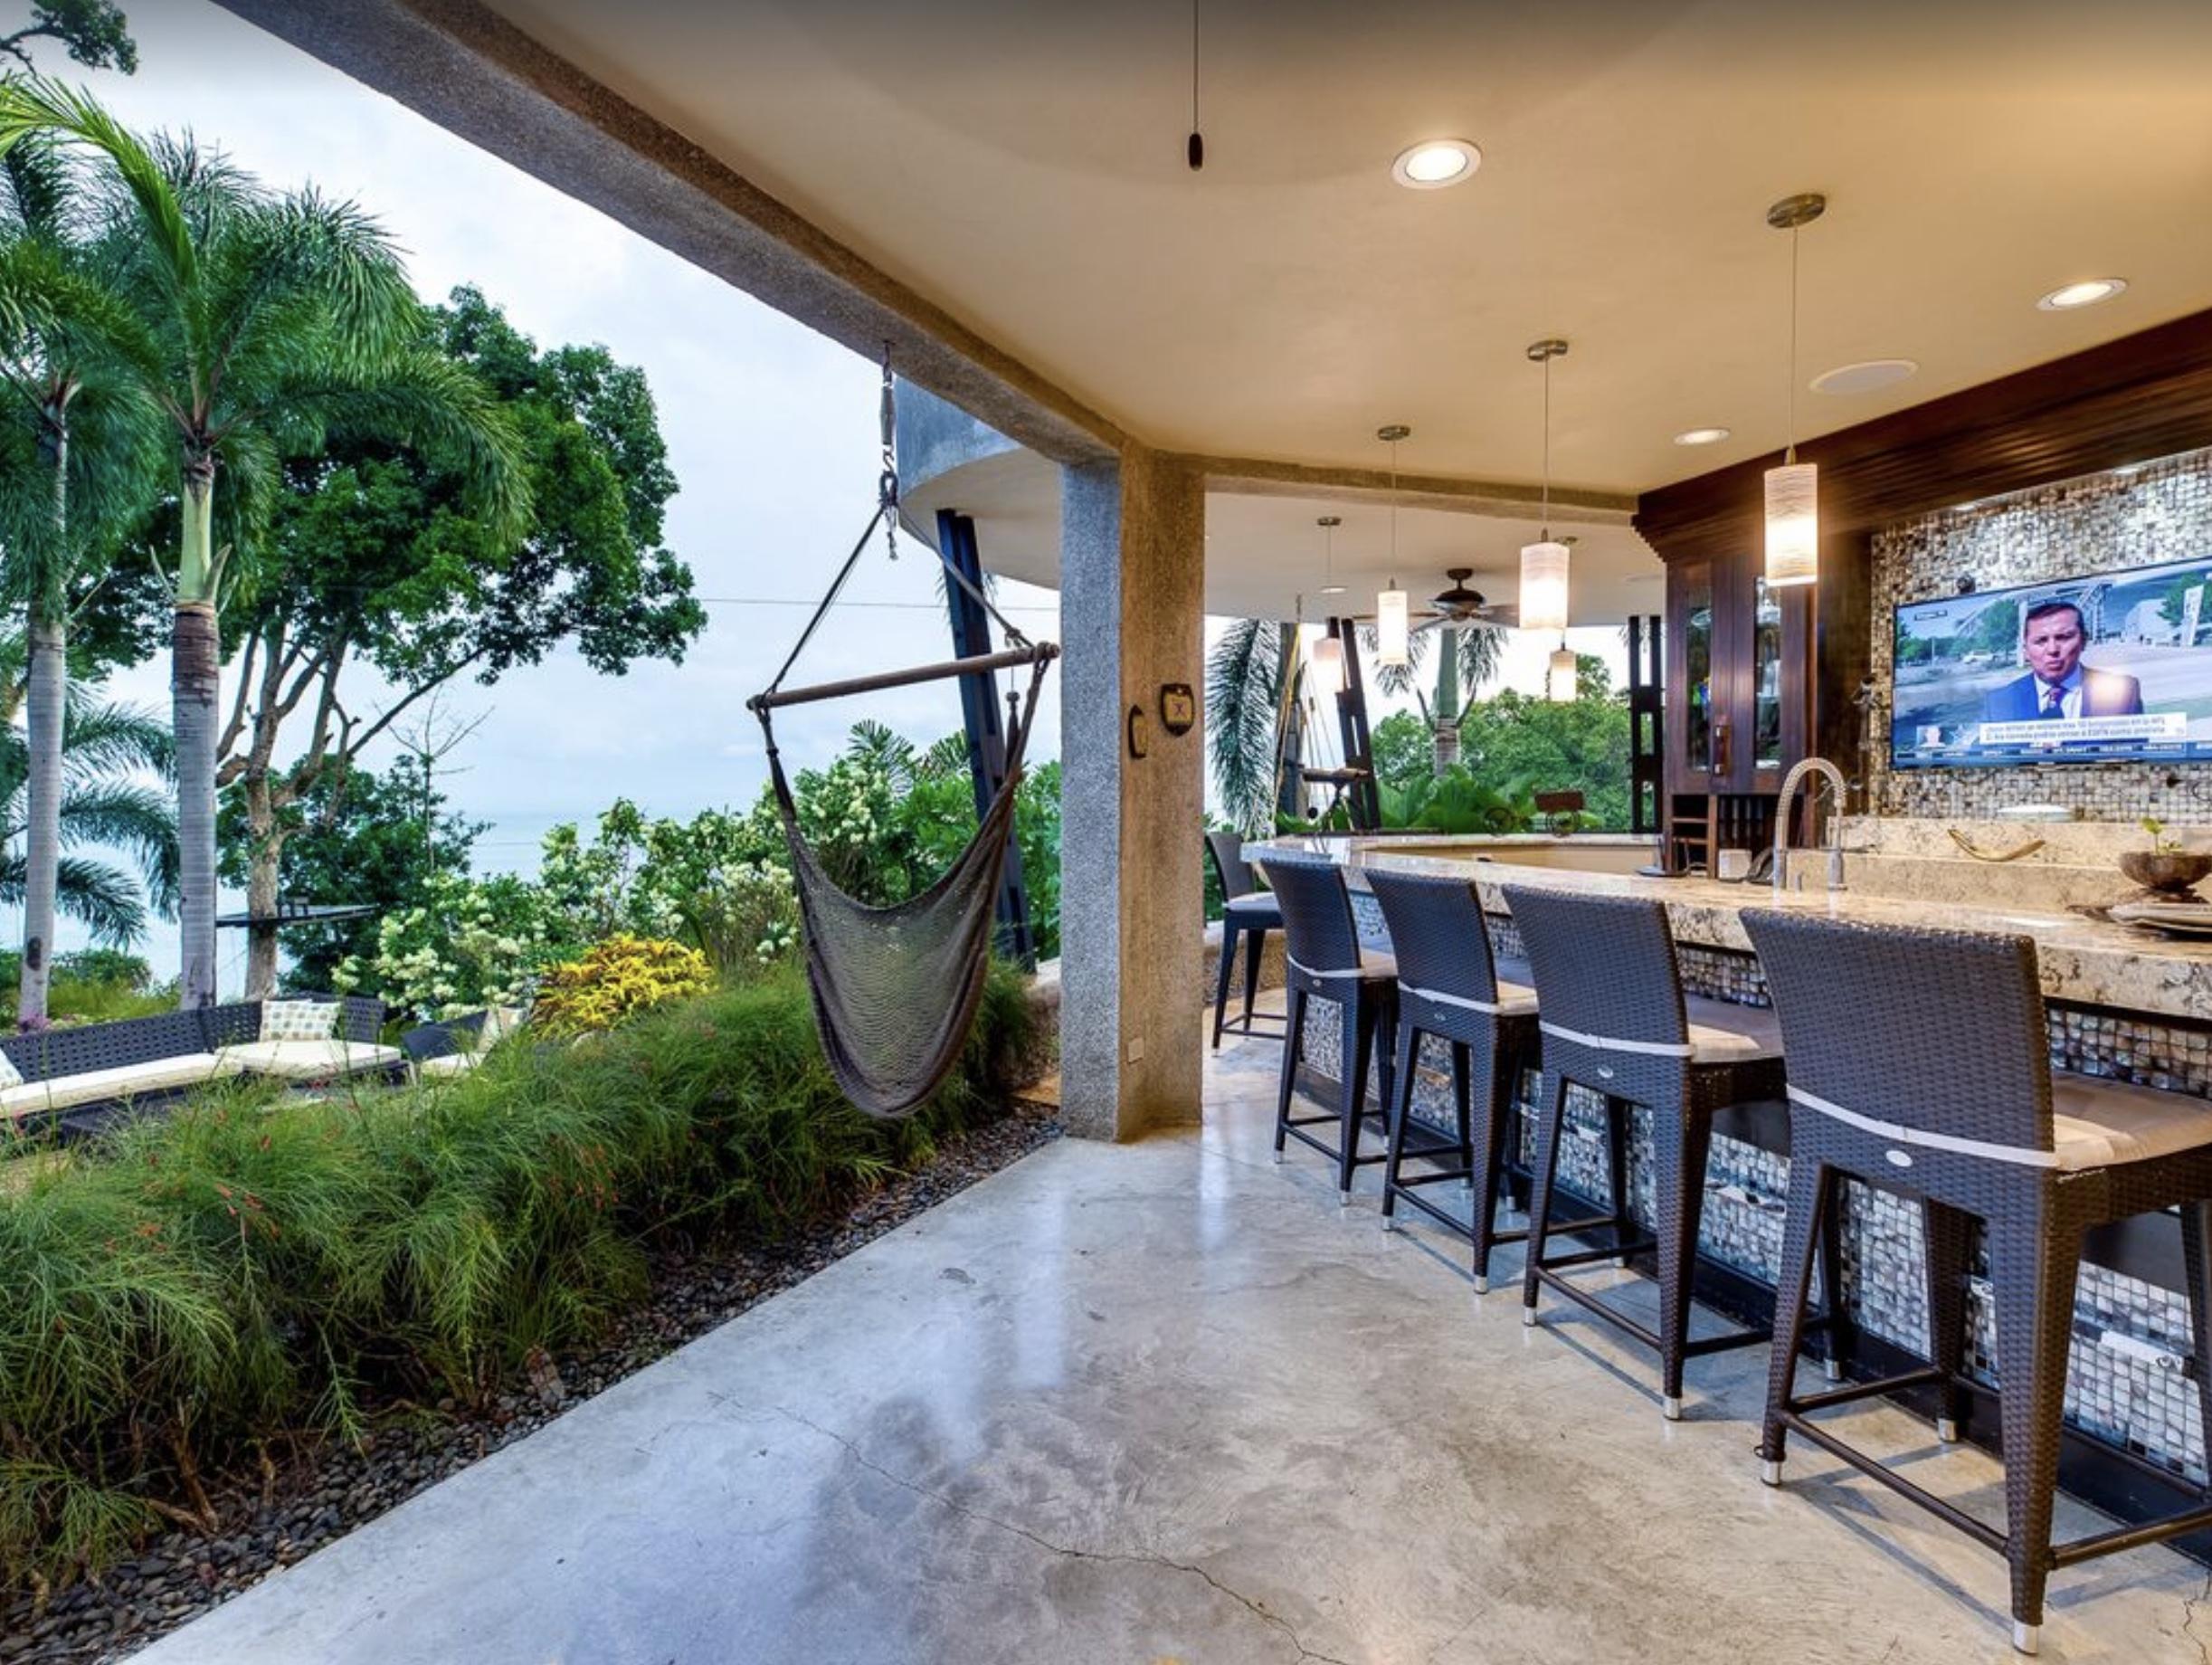 Toucan Chuey's, the onsite  indoor/outdoor bar